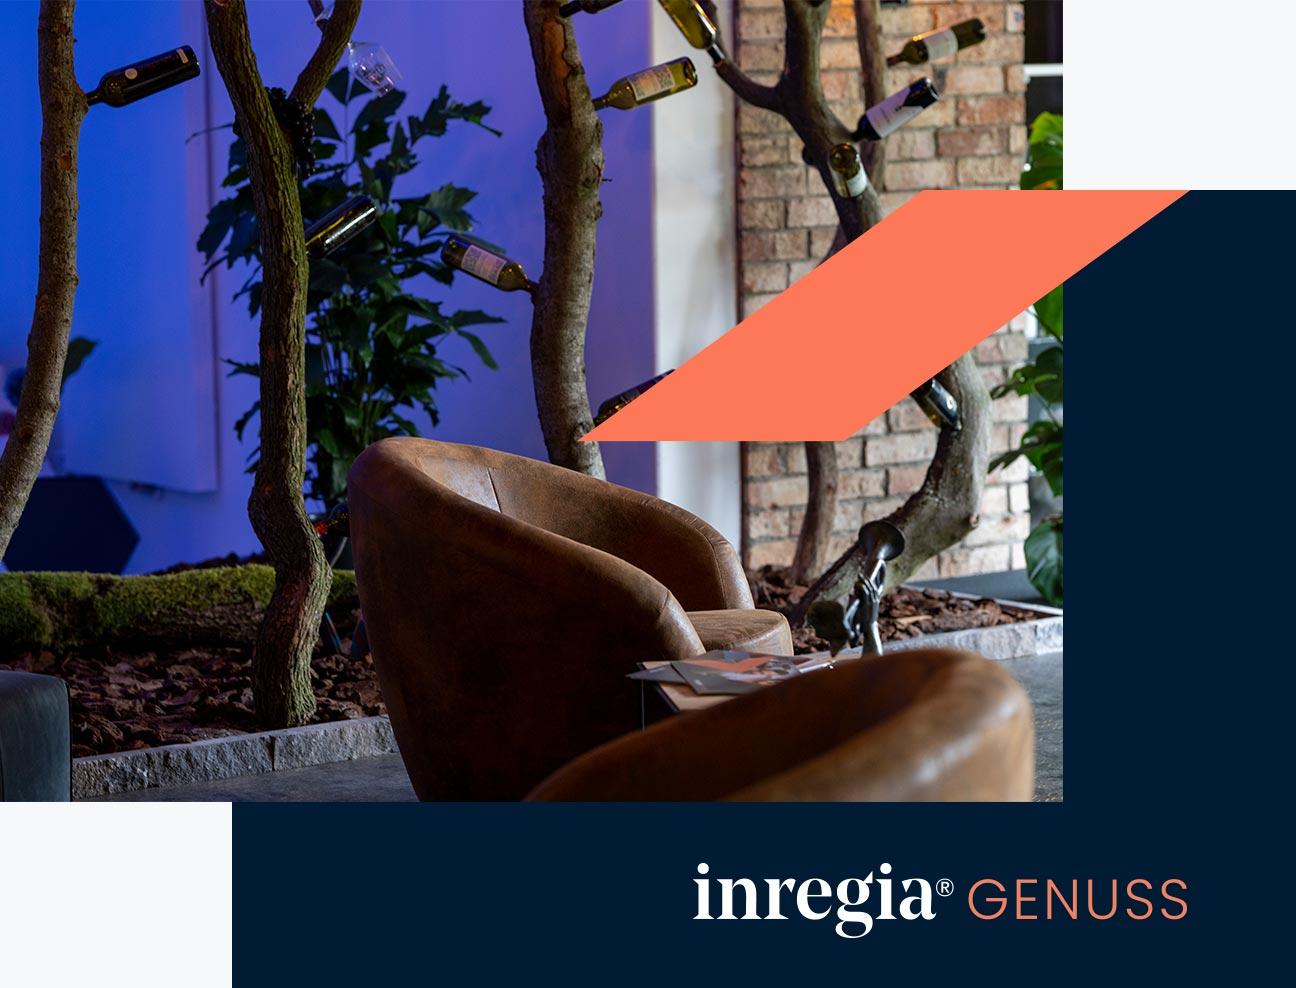 taste it inregia lounge genus regionale Produkte Genusslounge testen